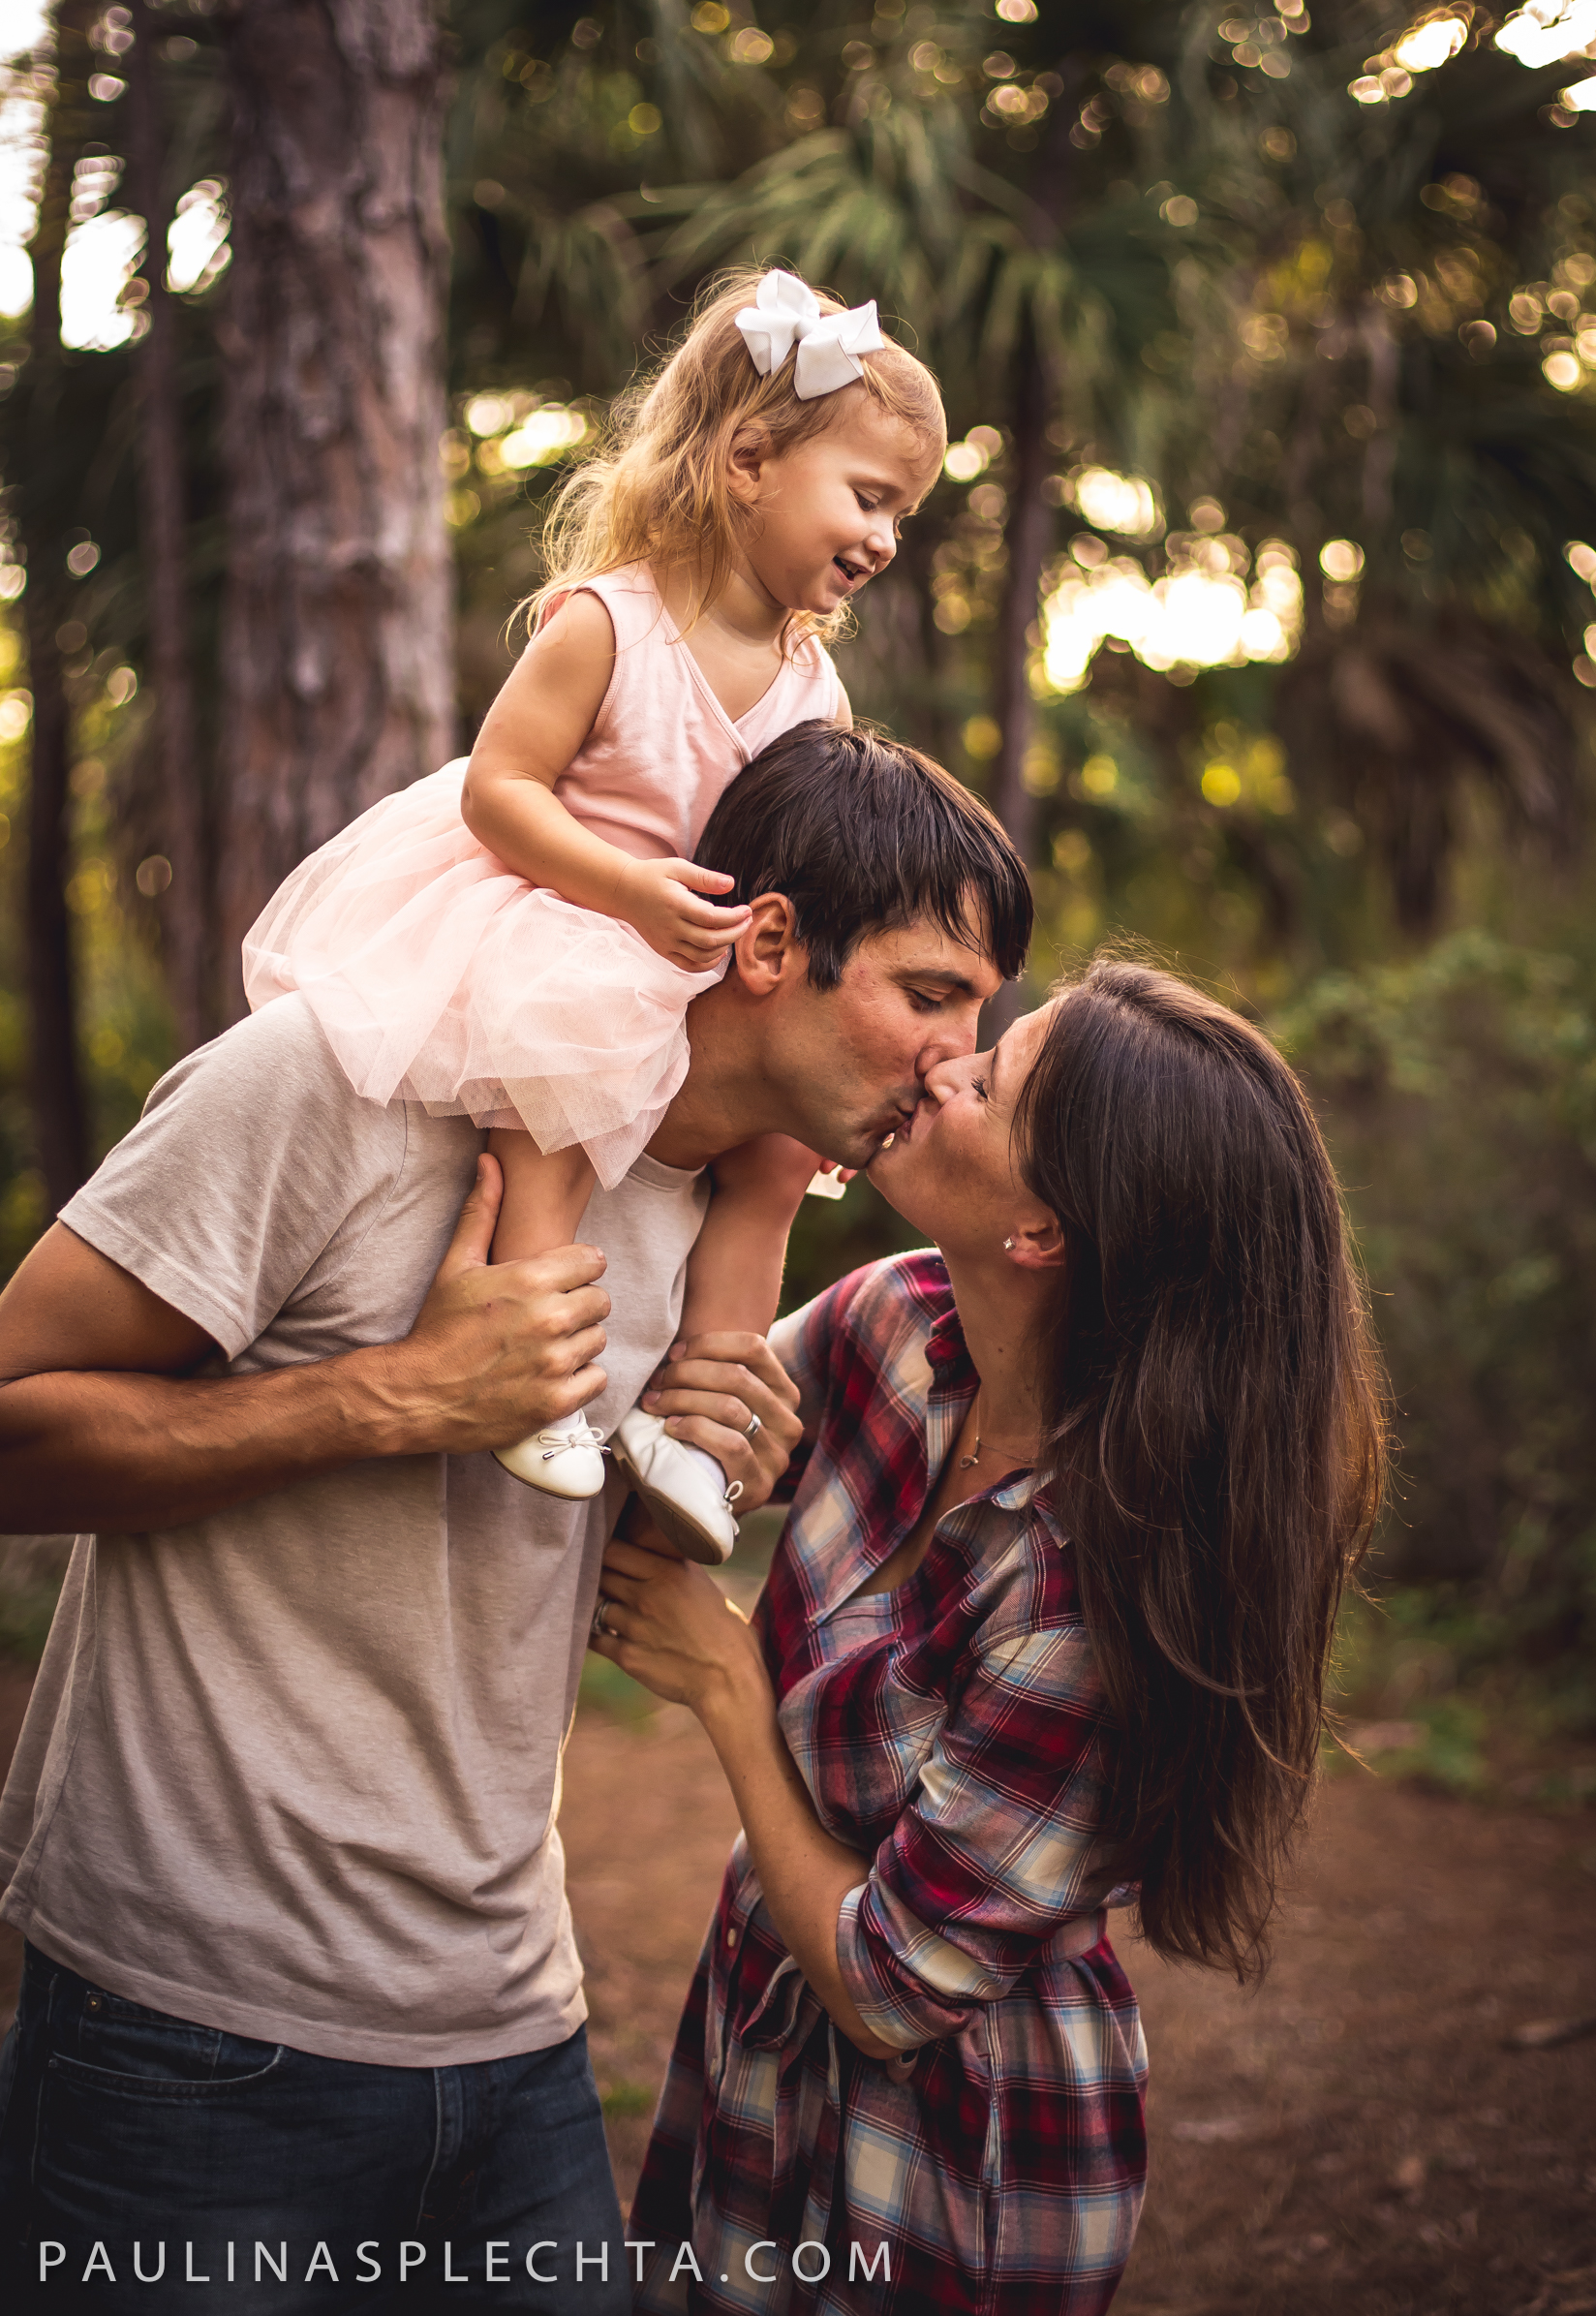 boca-raton-family-photography-photo-session-first-birthday-delray-beach-cake-smash-breastfeeding-la-leche-league-27.jpg